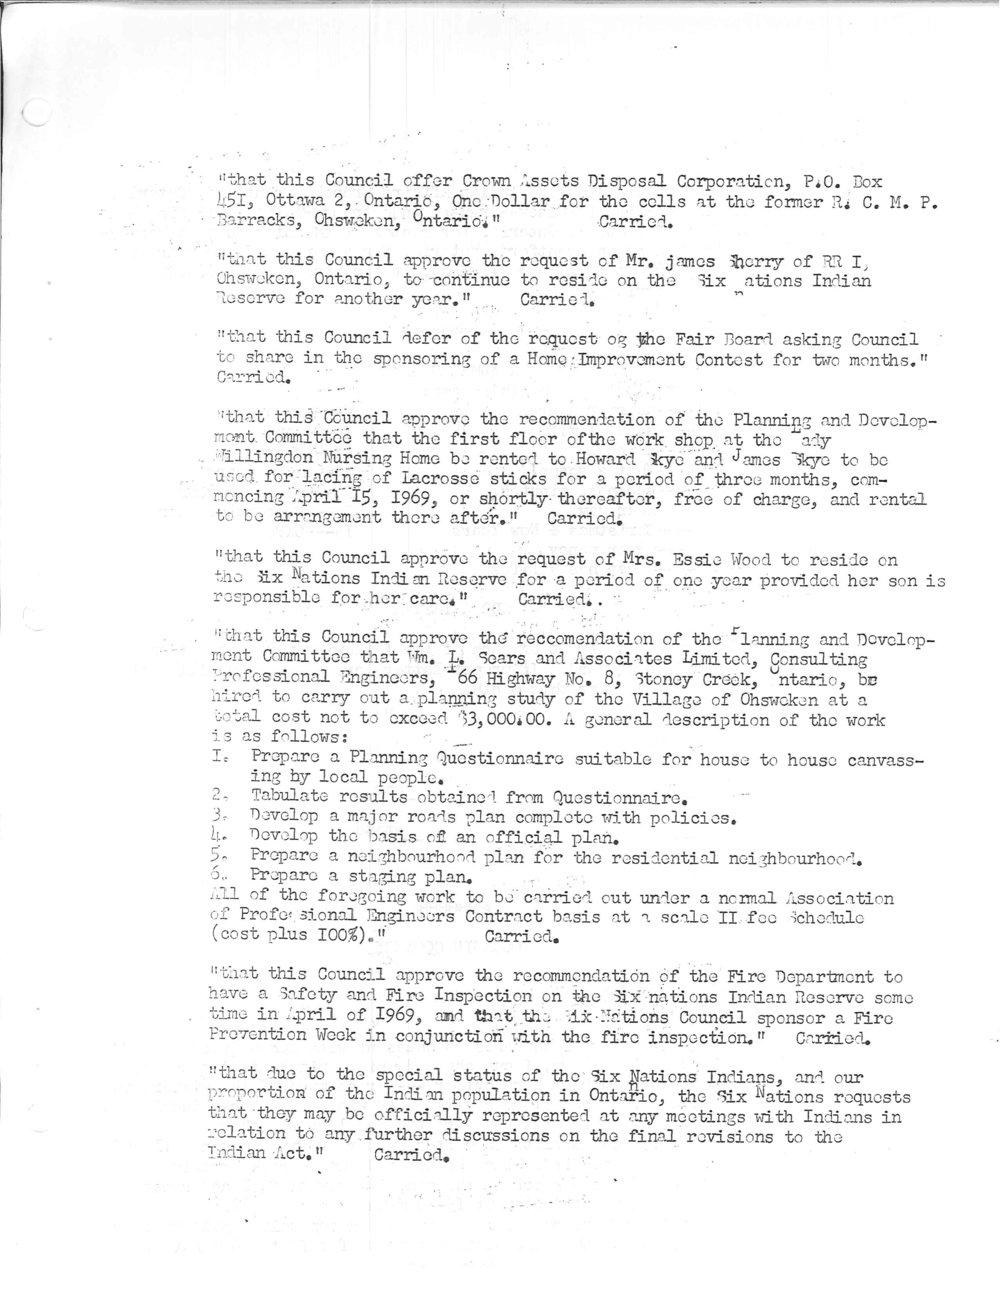 The Moccasin News - Vol.II No.I - February 15, 1969